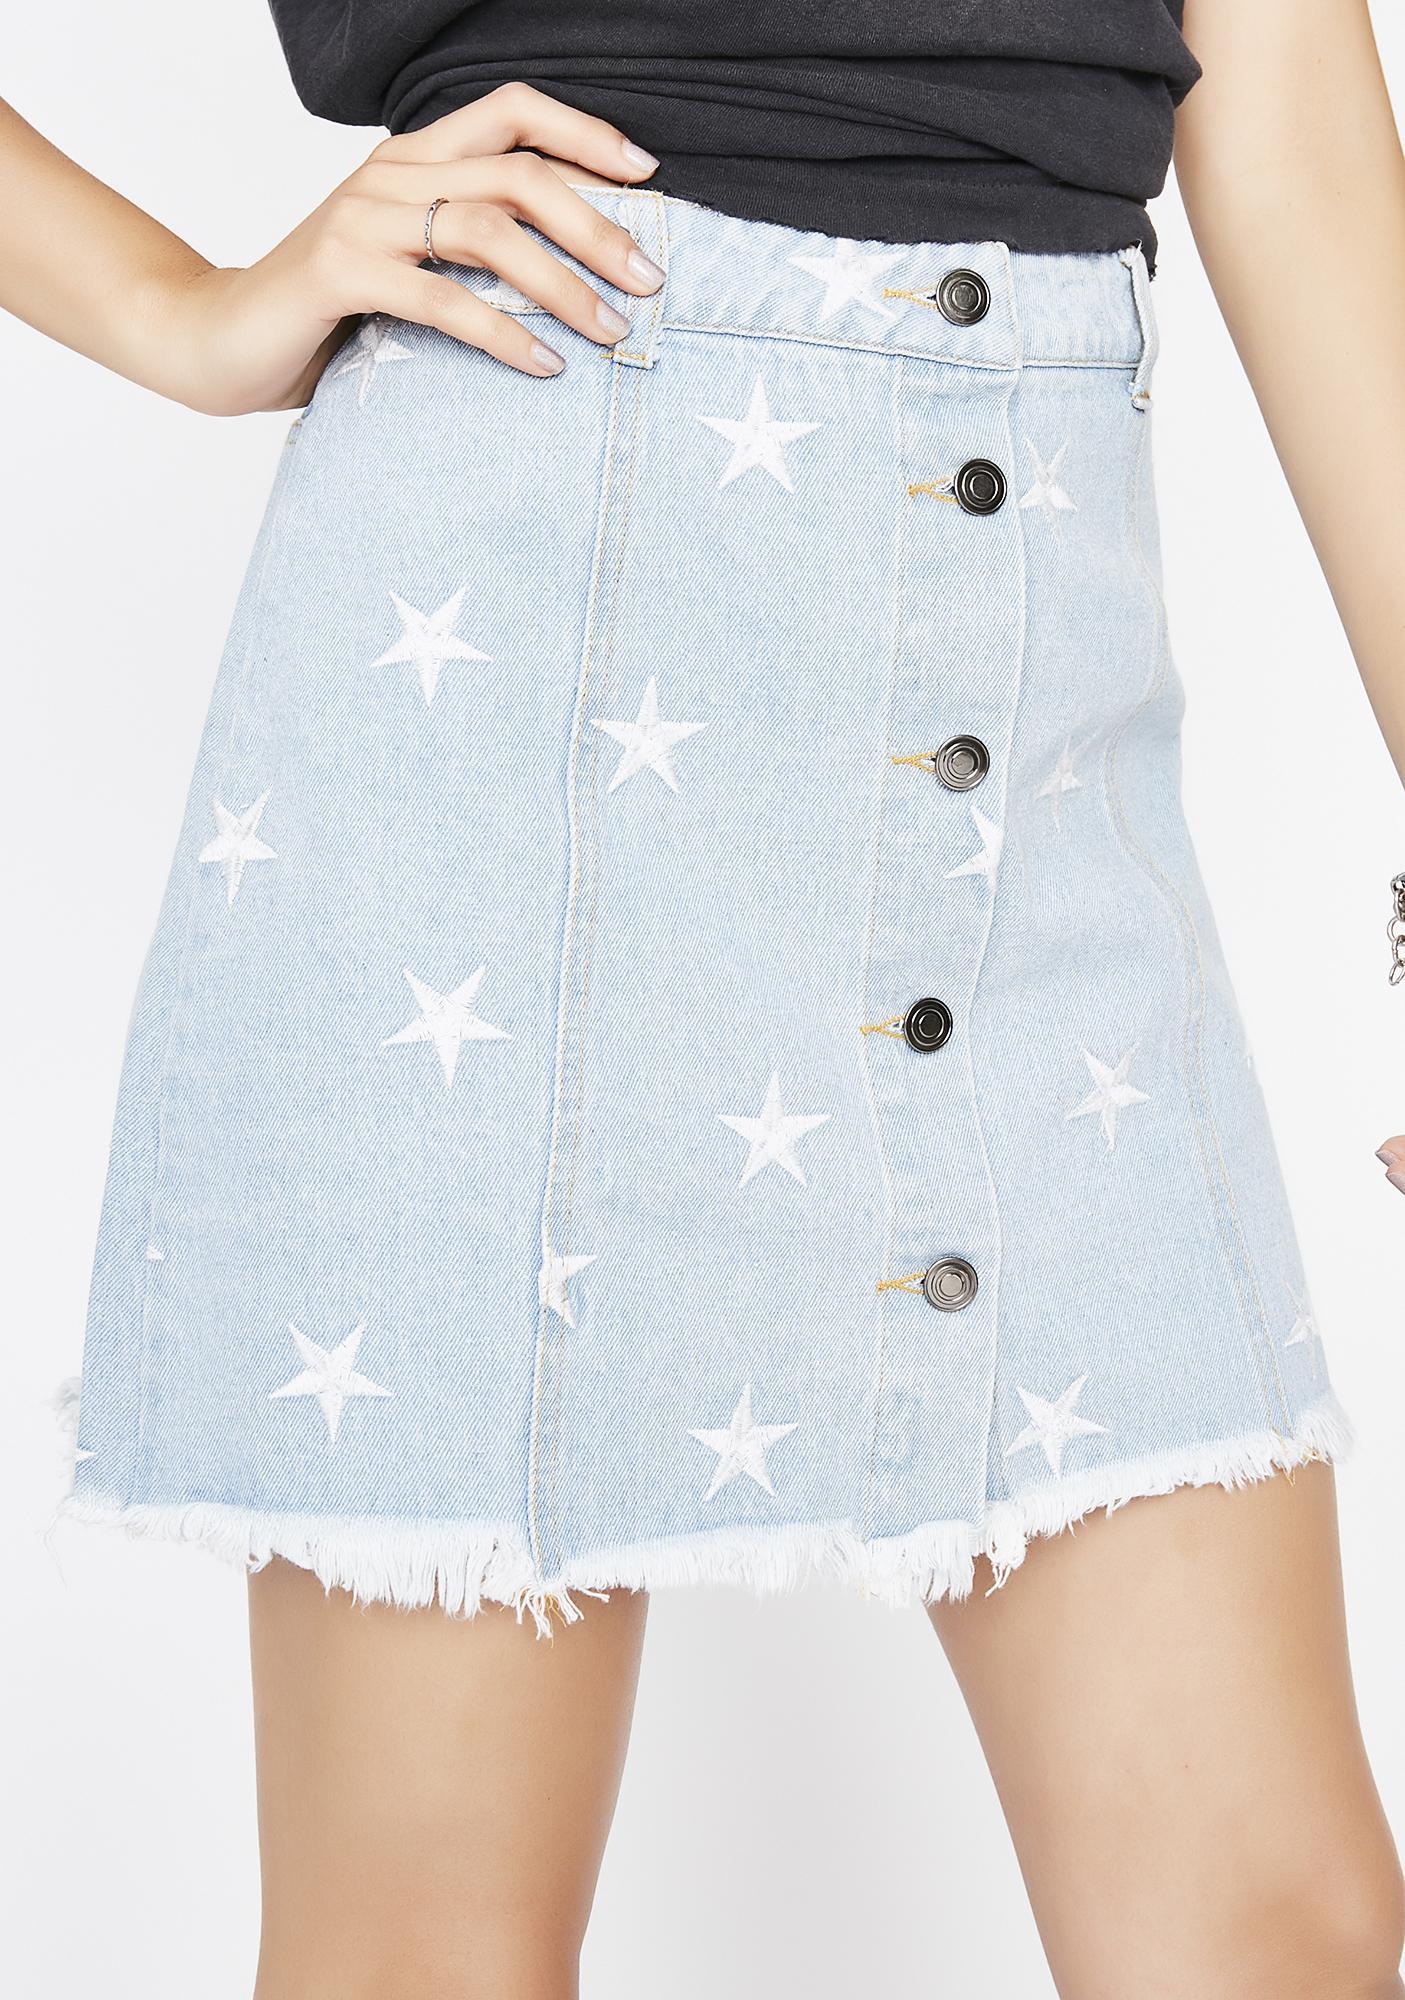 Beaming Bright Denim Skirt